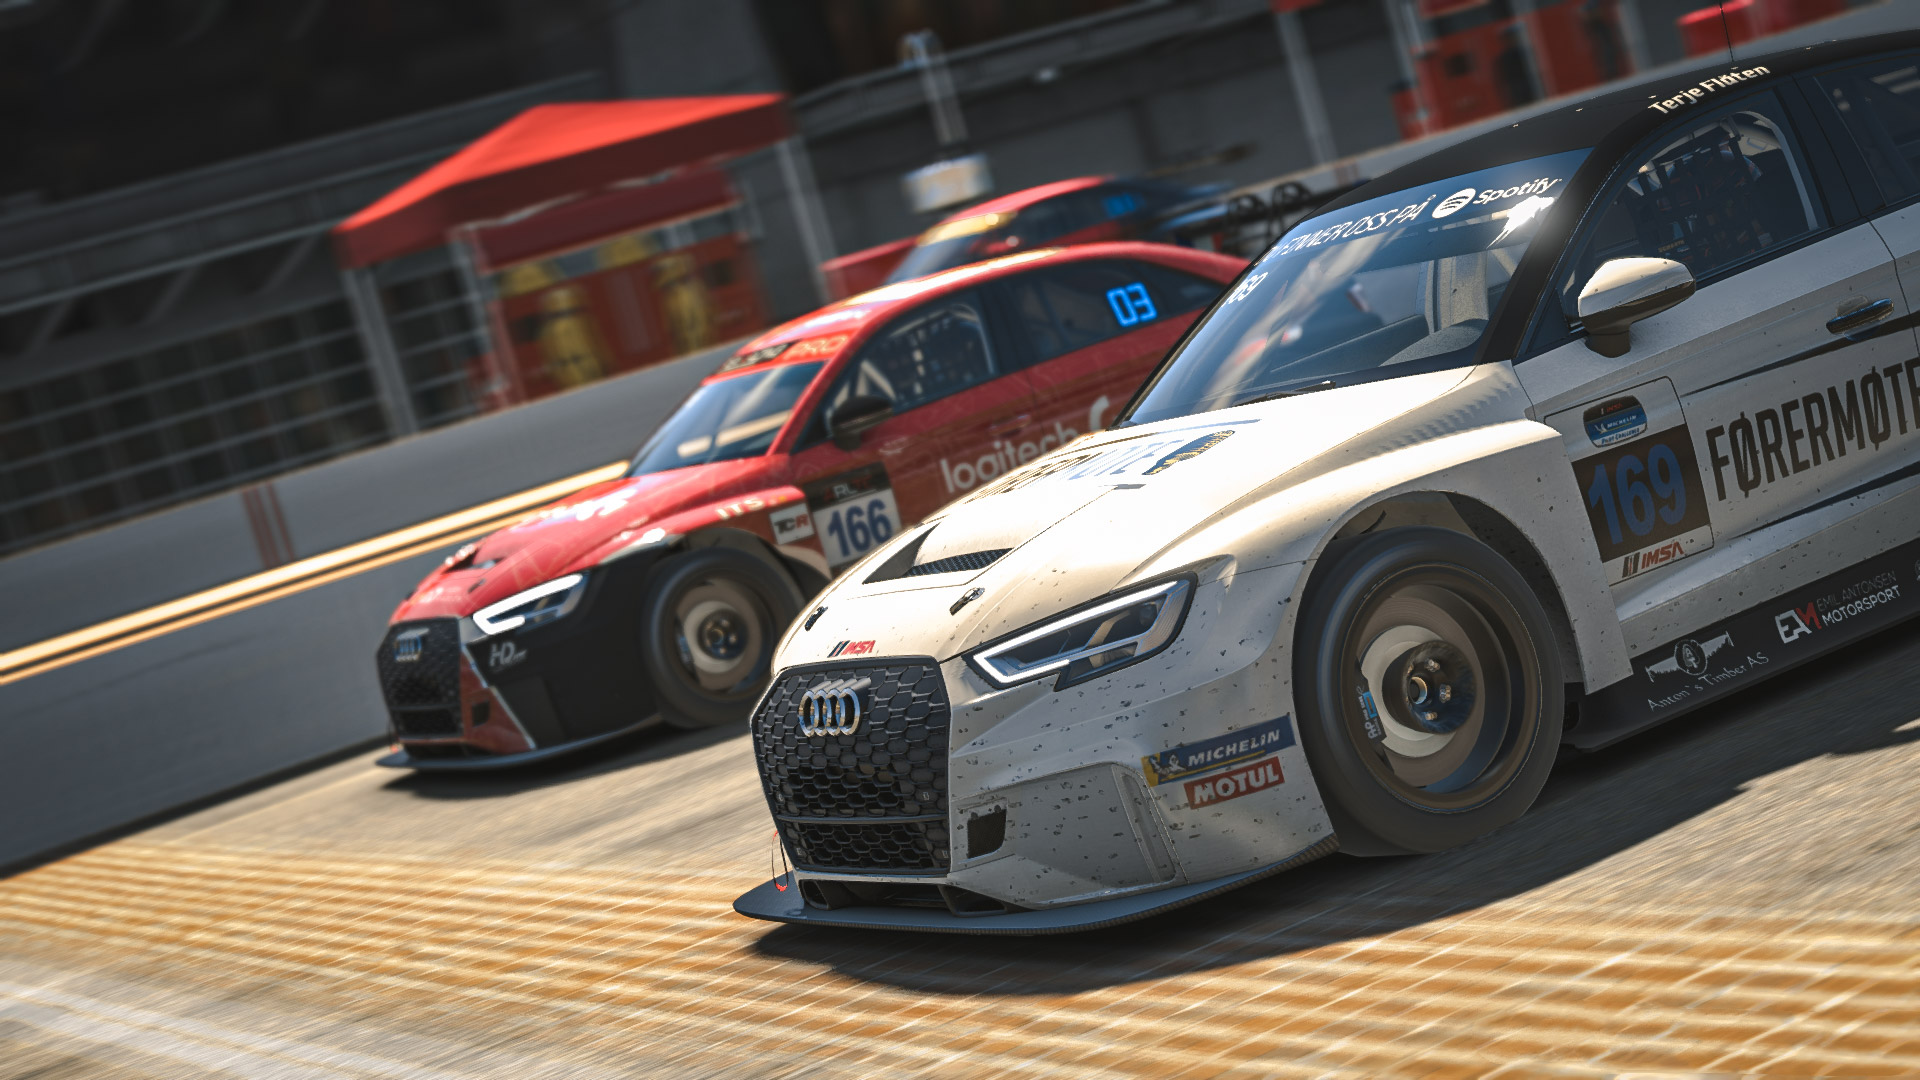 Apex Racing League Touring Car Championship | Round 10 at Indianapolis